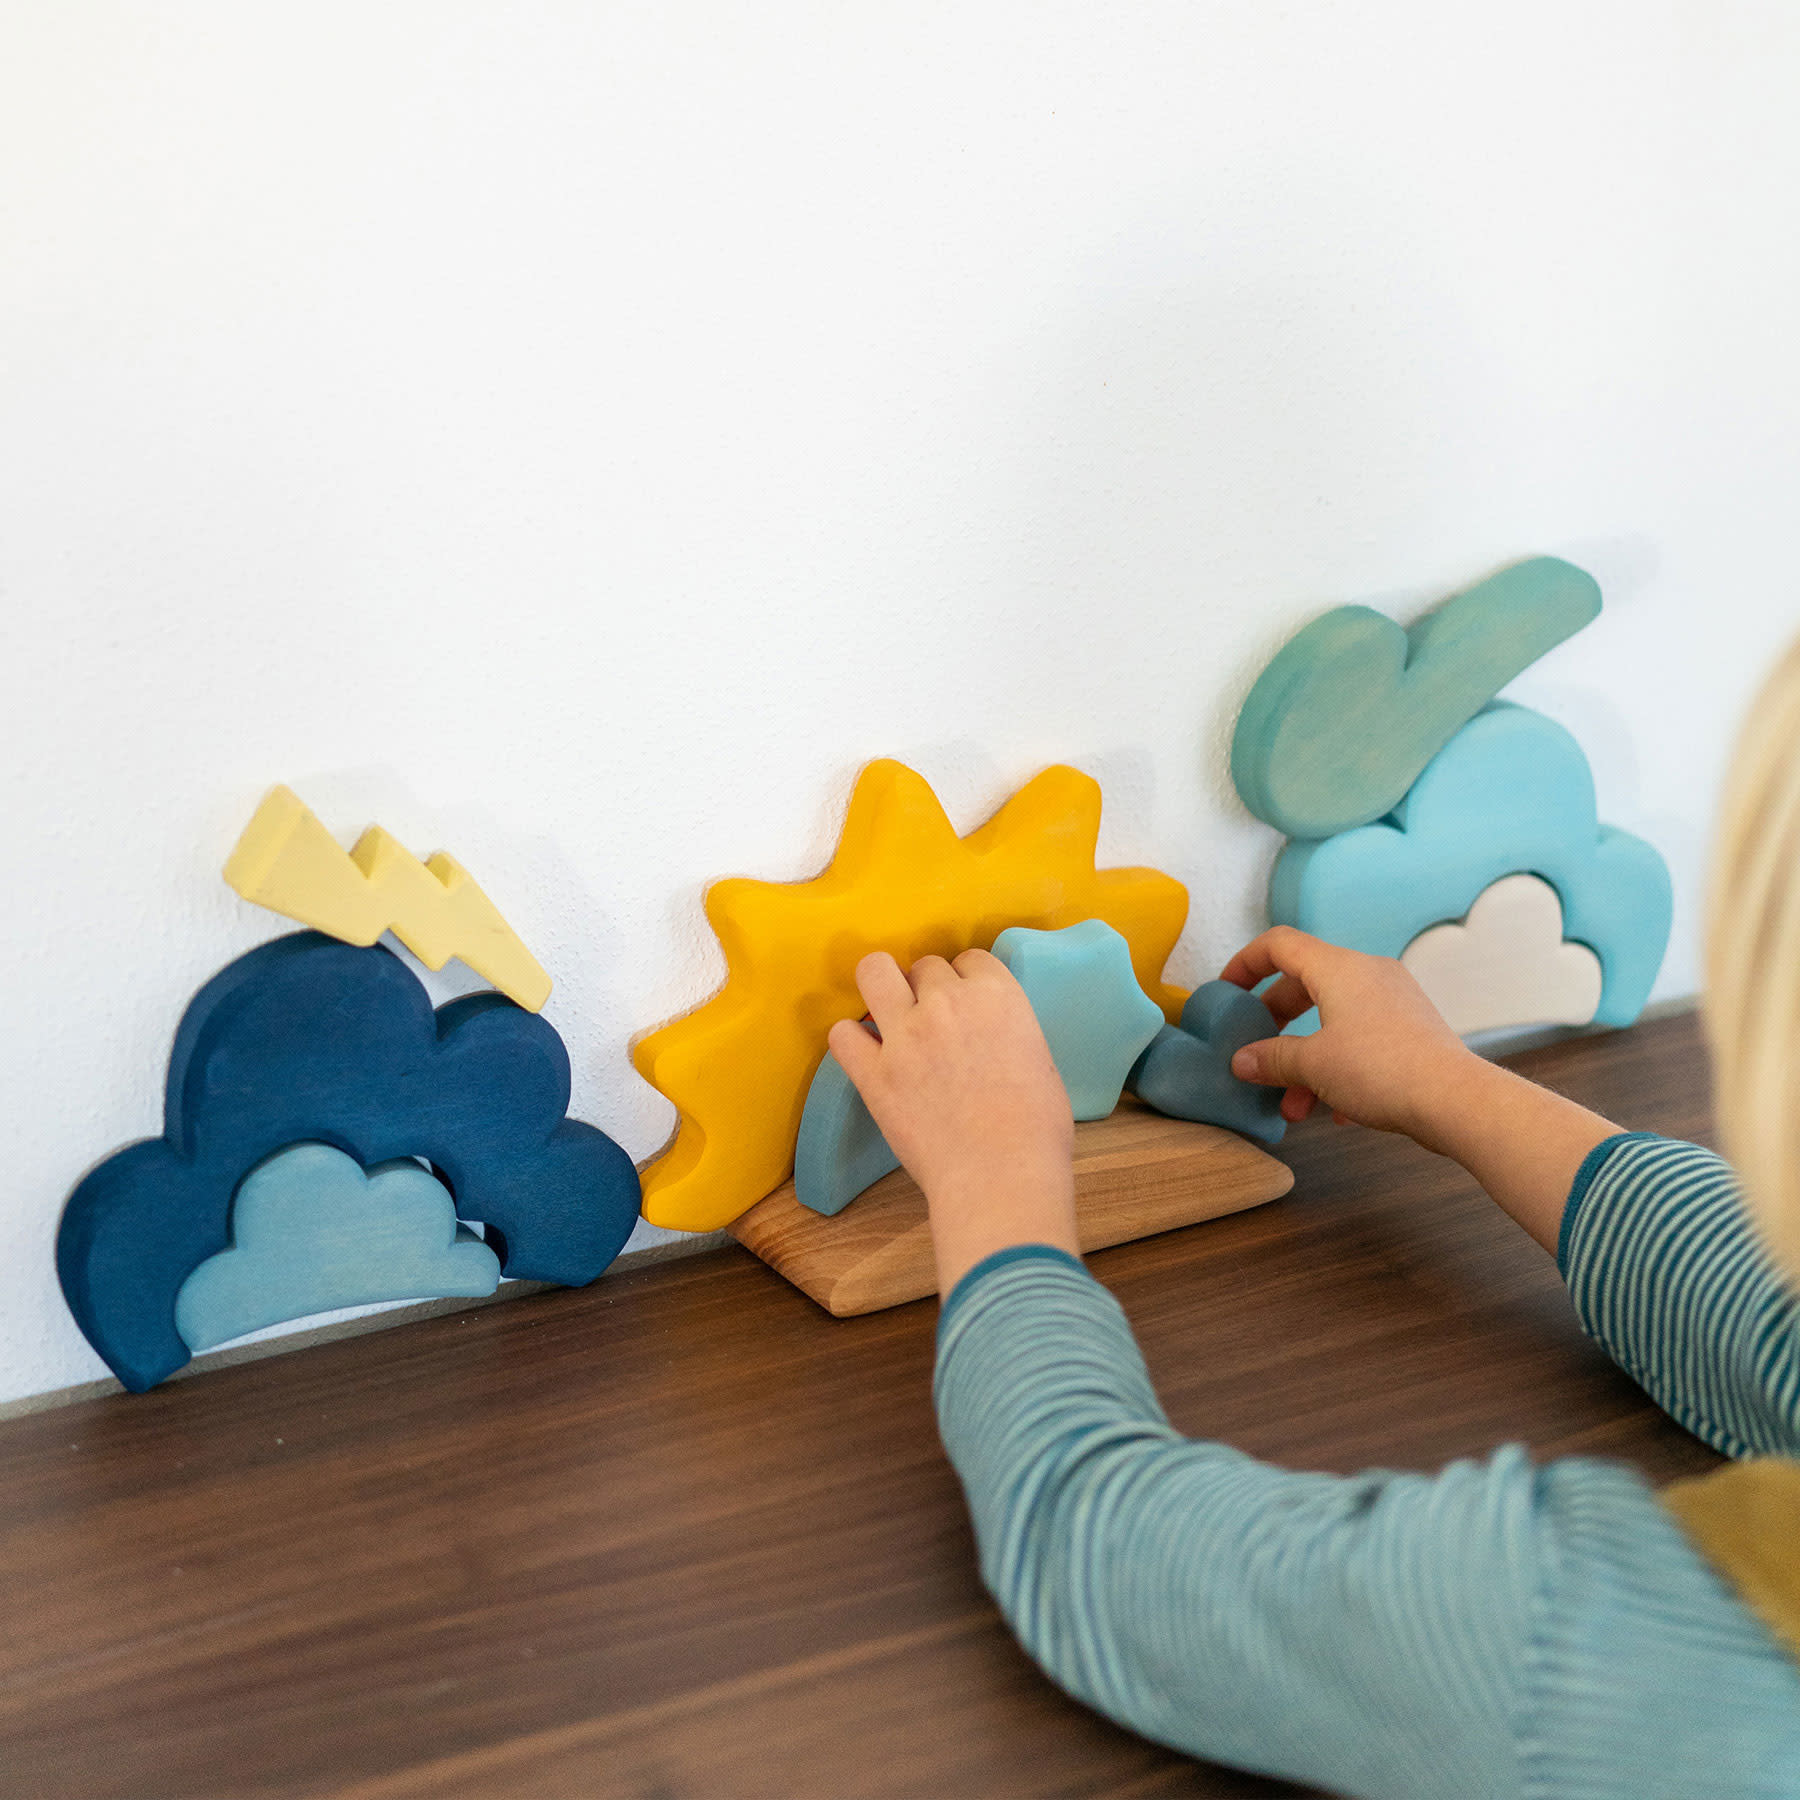 Grimm's Toys Weather Shapes Building Blocks Set